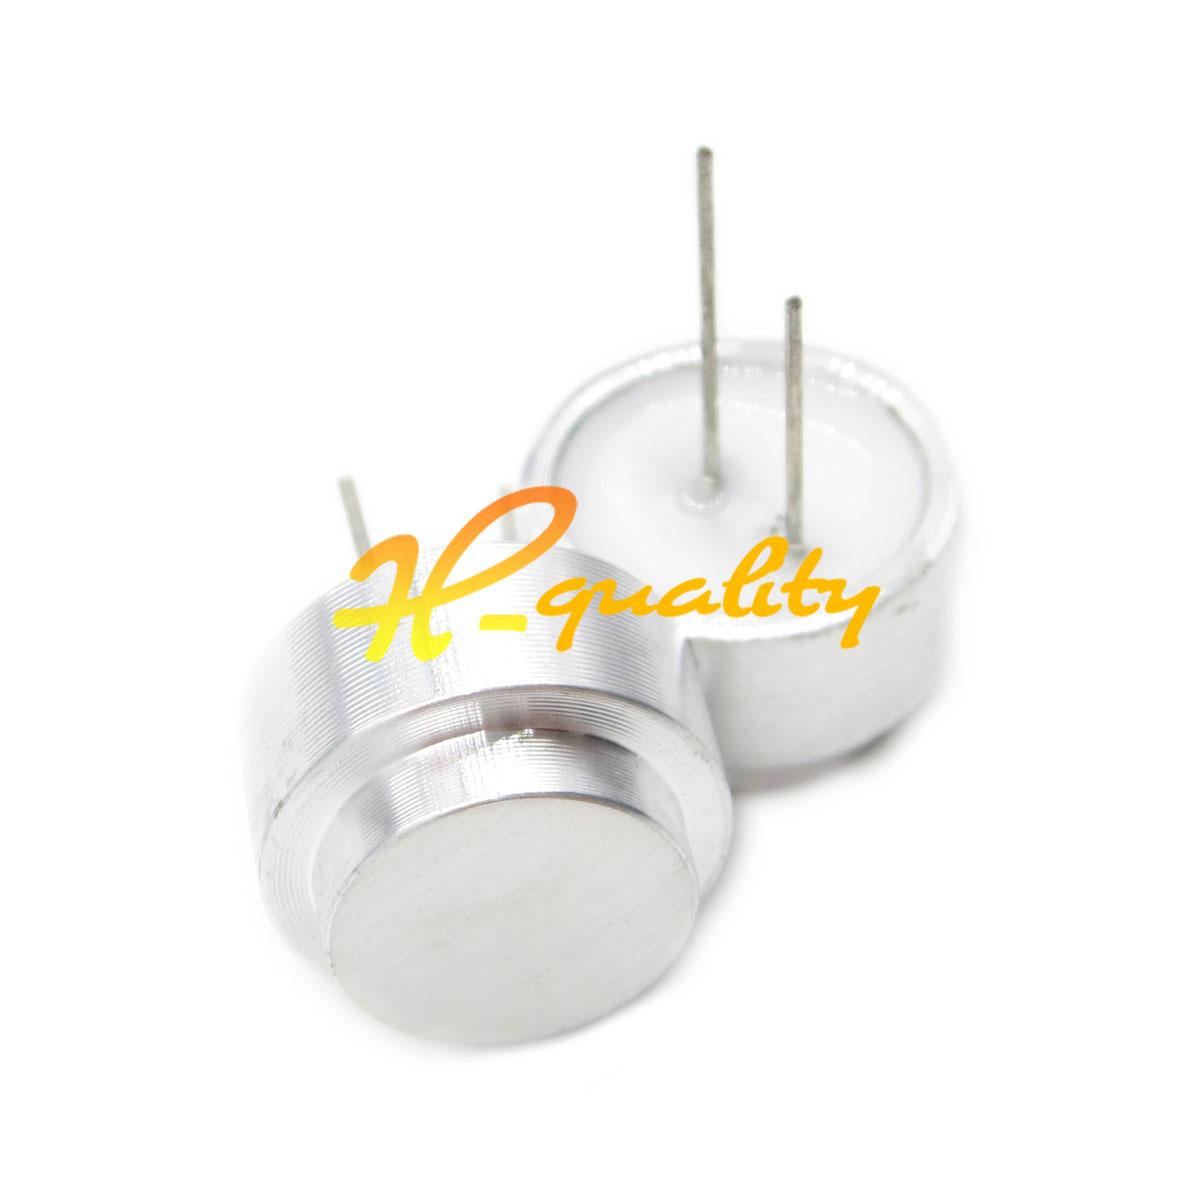 16mm 40khz Ultrasonic Sensors Integrated Transceiver Waterproof Transmitter Circuit Diameter